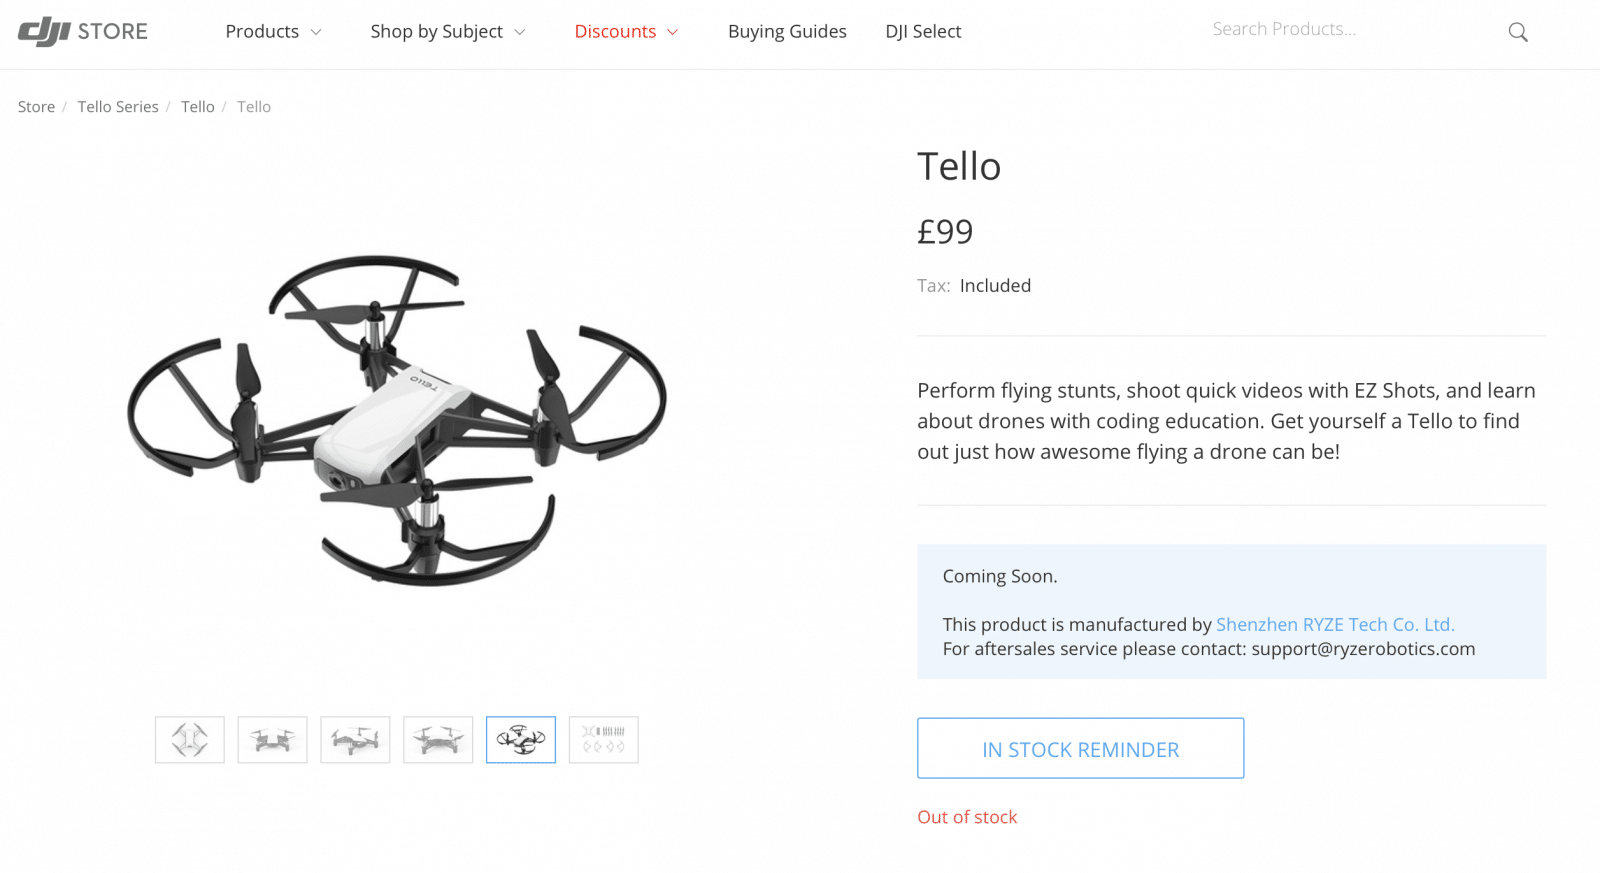 DJI Launch Tello A GBP99 Nano Drone At 2018 Consumer Electronics Show